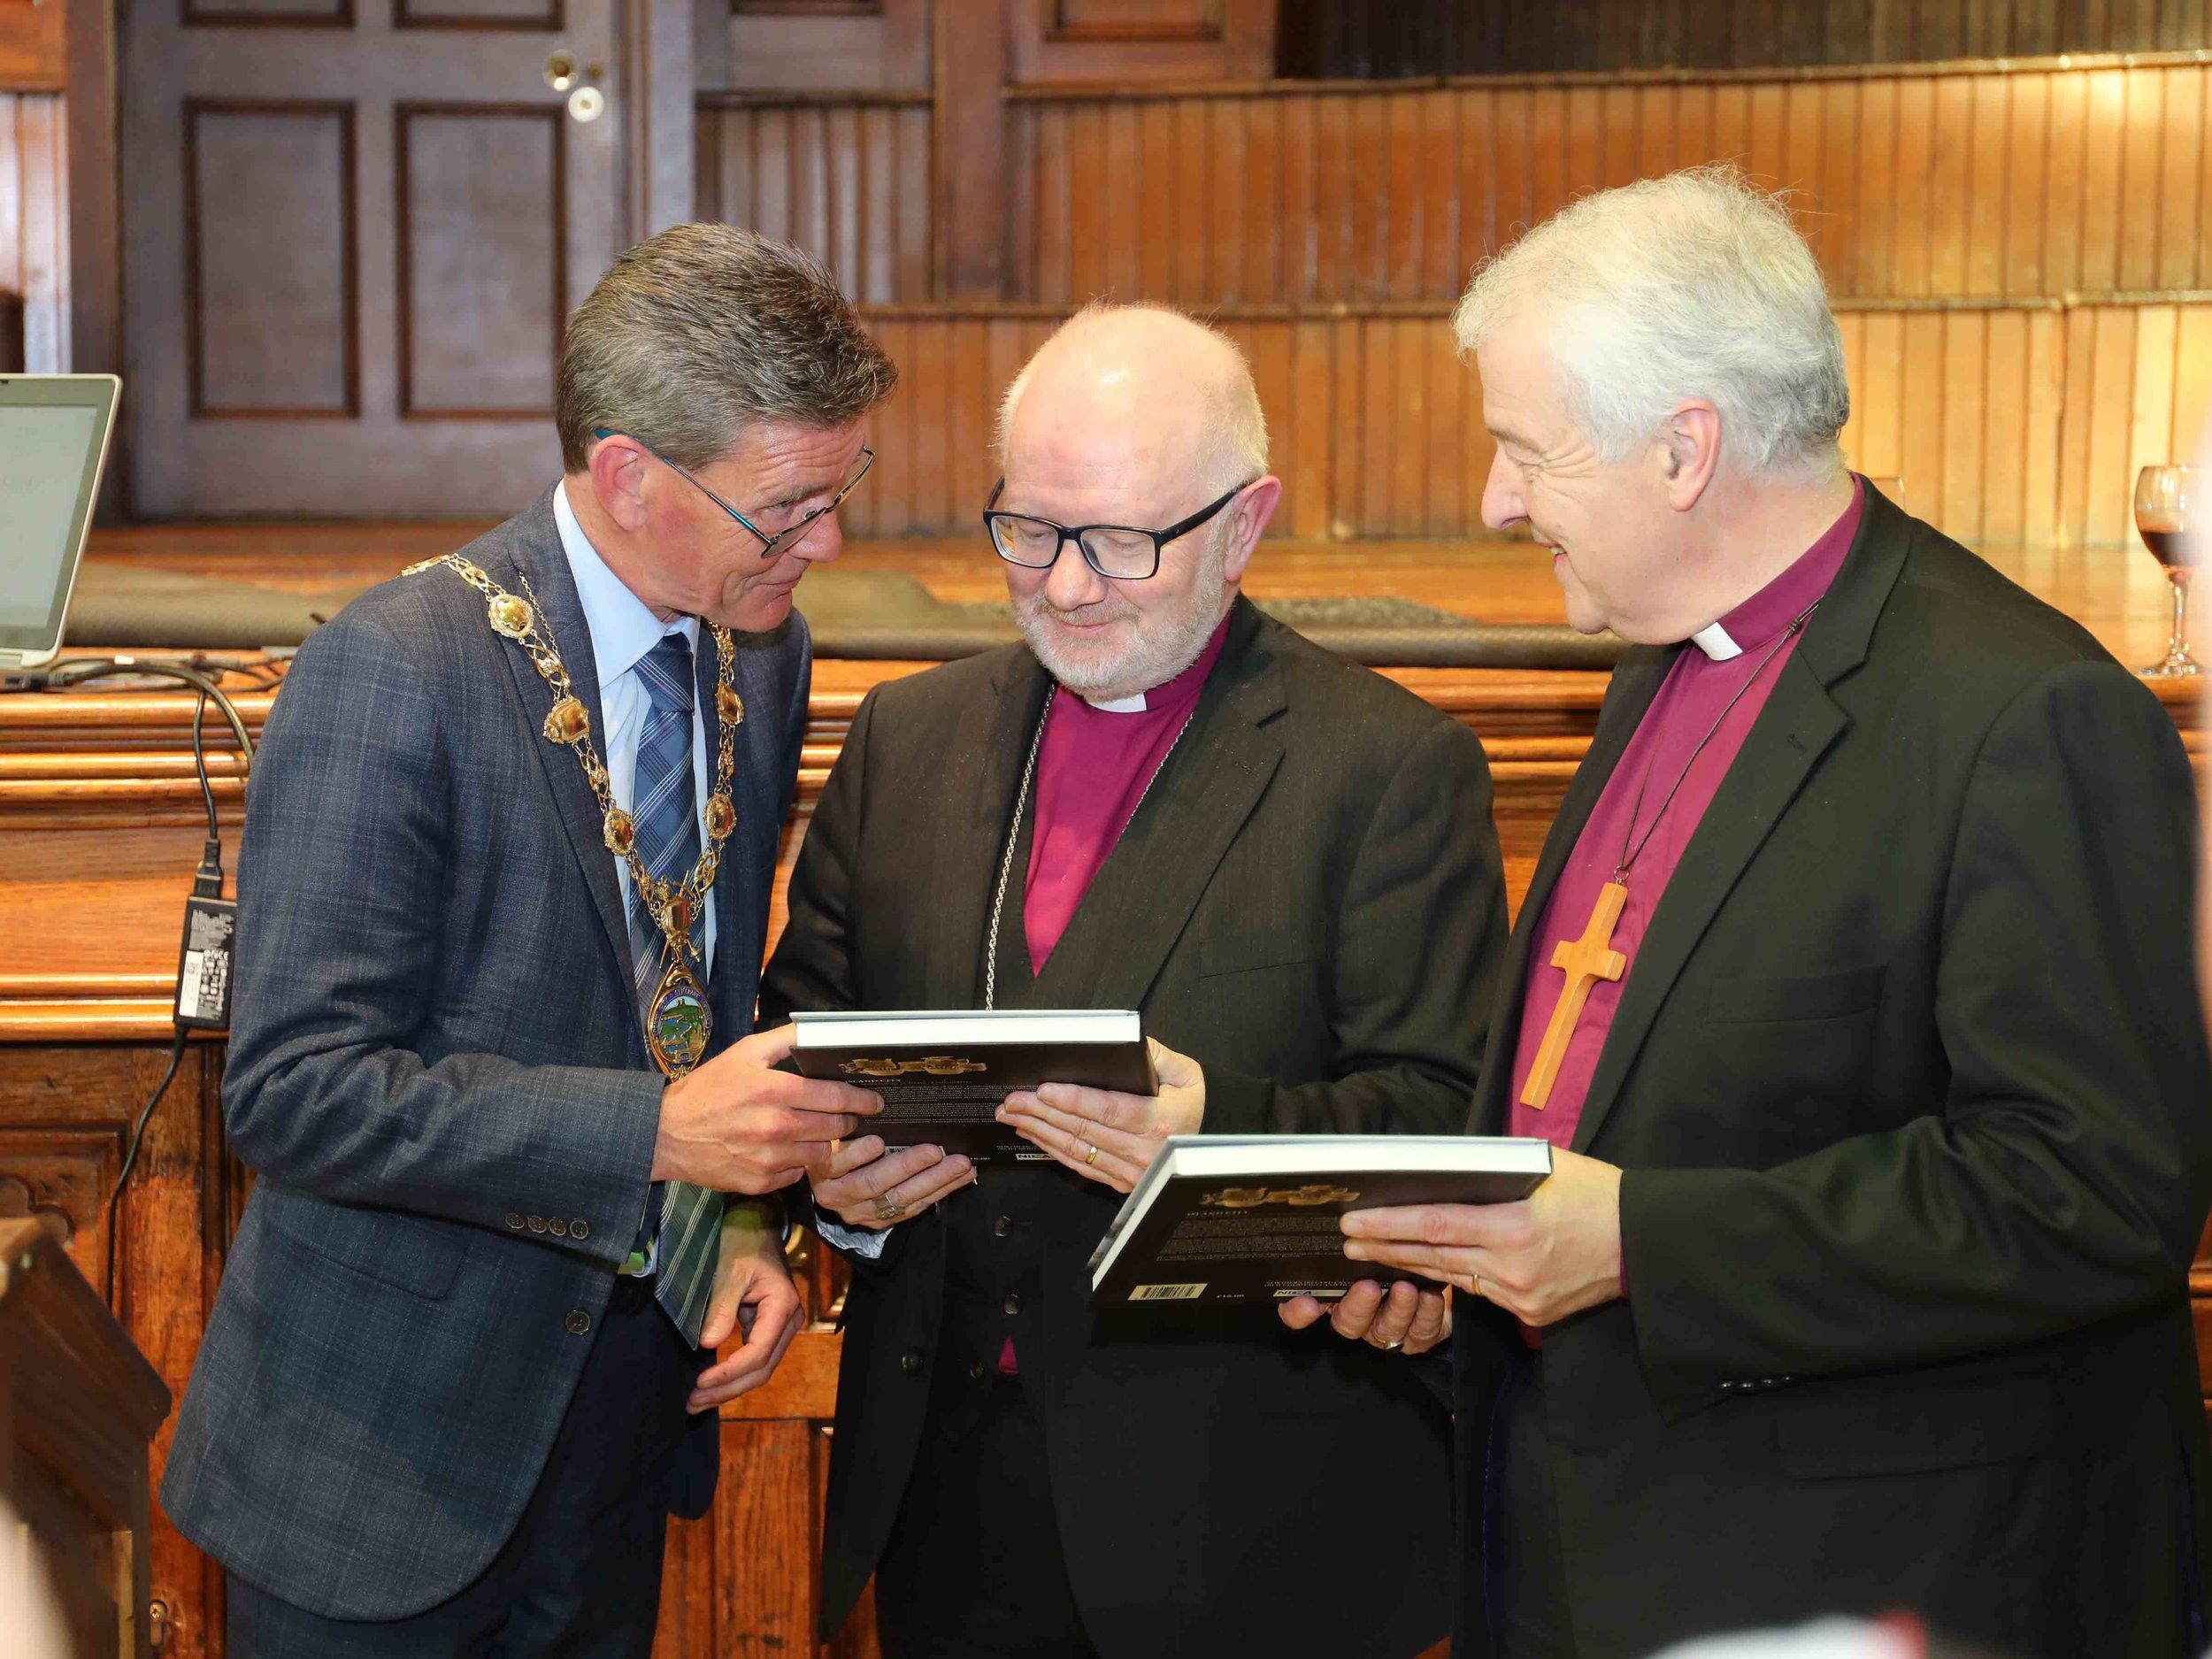 Mayor John Boyle presents a book to Archbishop Richard Clarke and Archbishop Michael Jackson